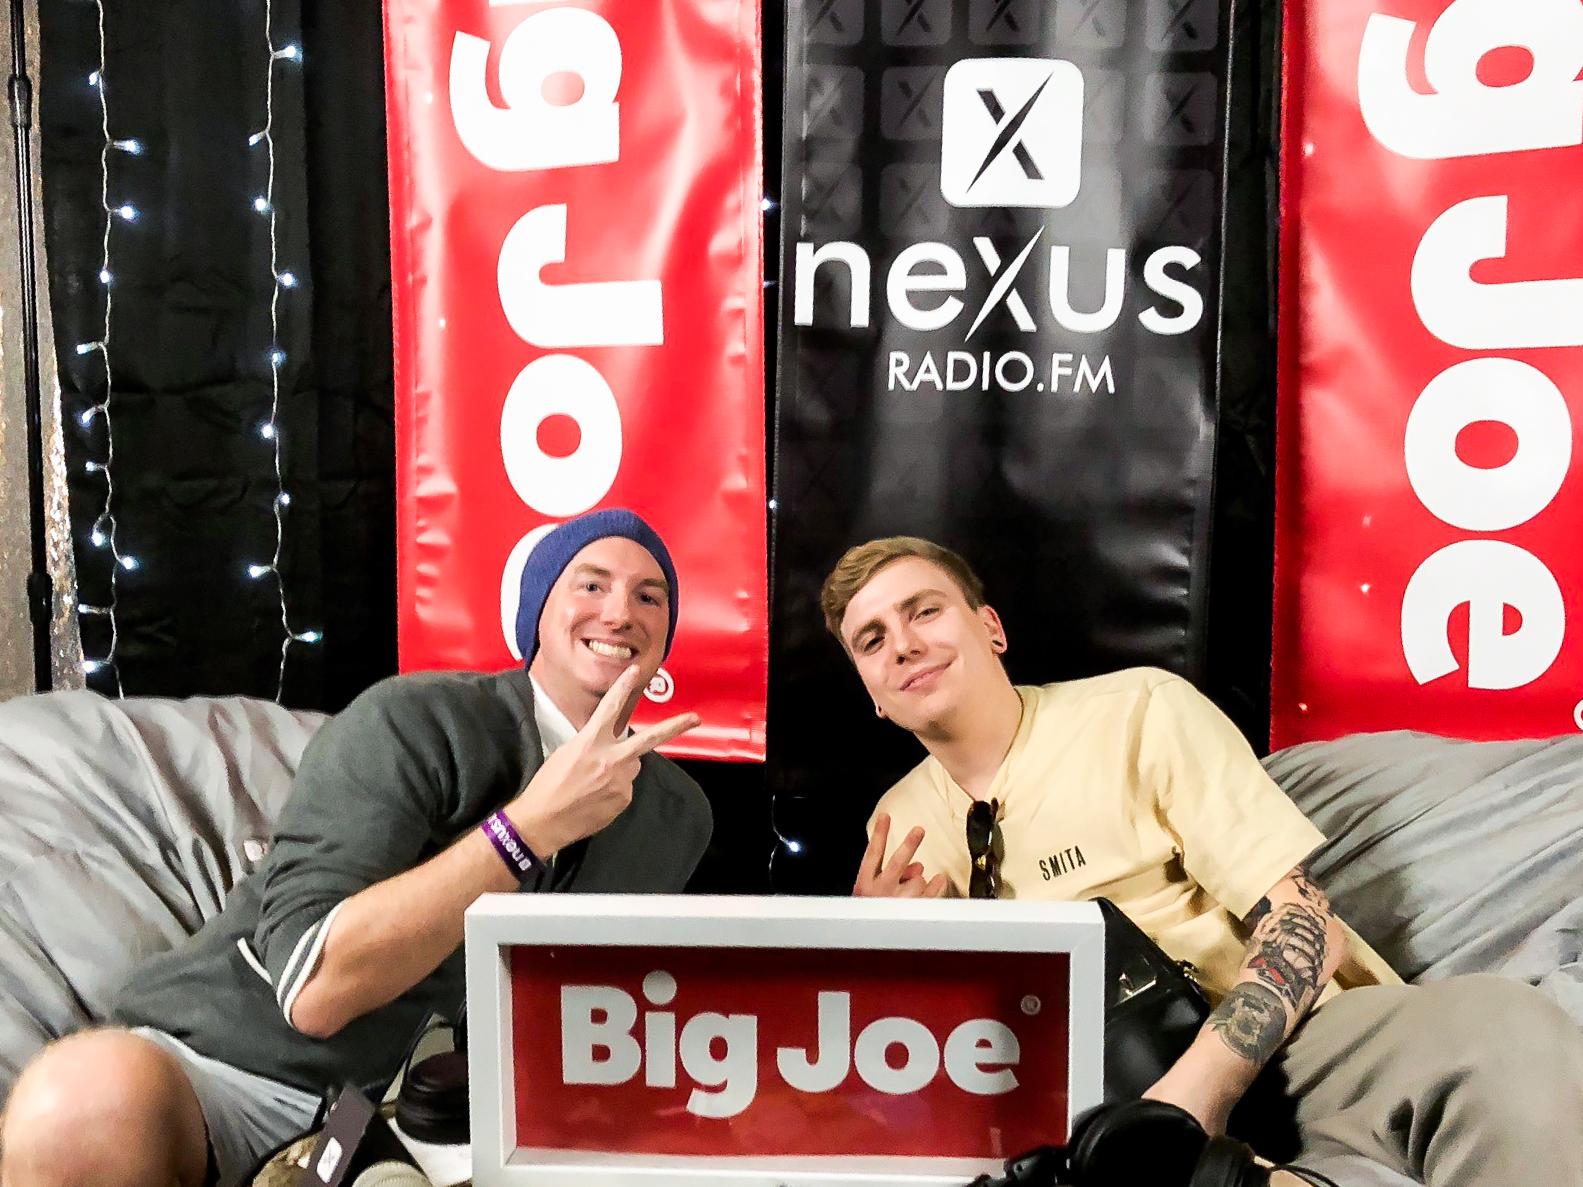 Nexus-Lounge-2018-snavs